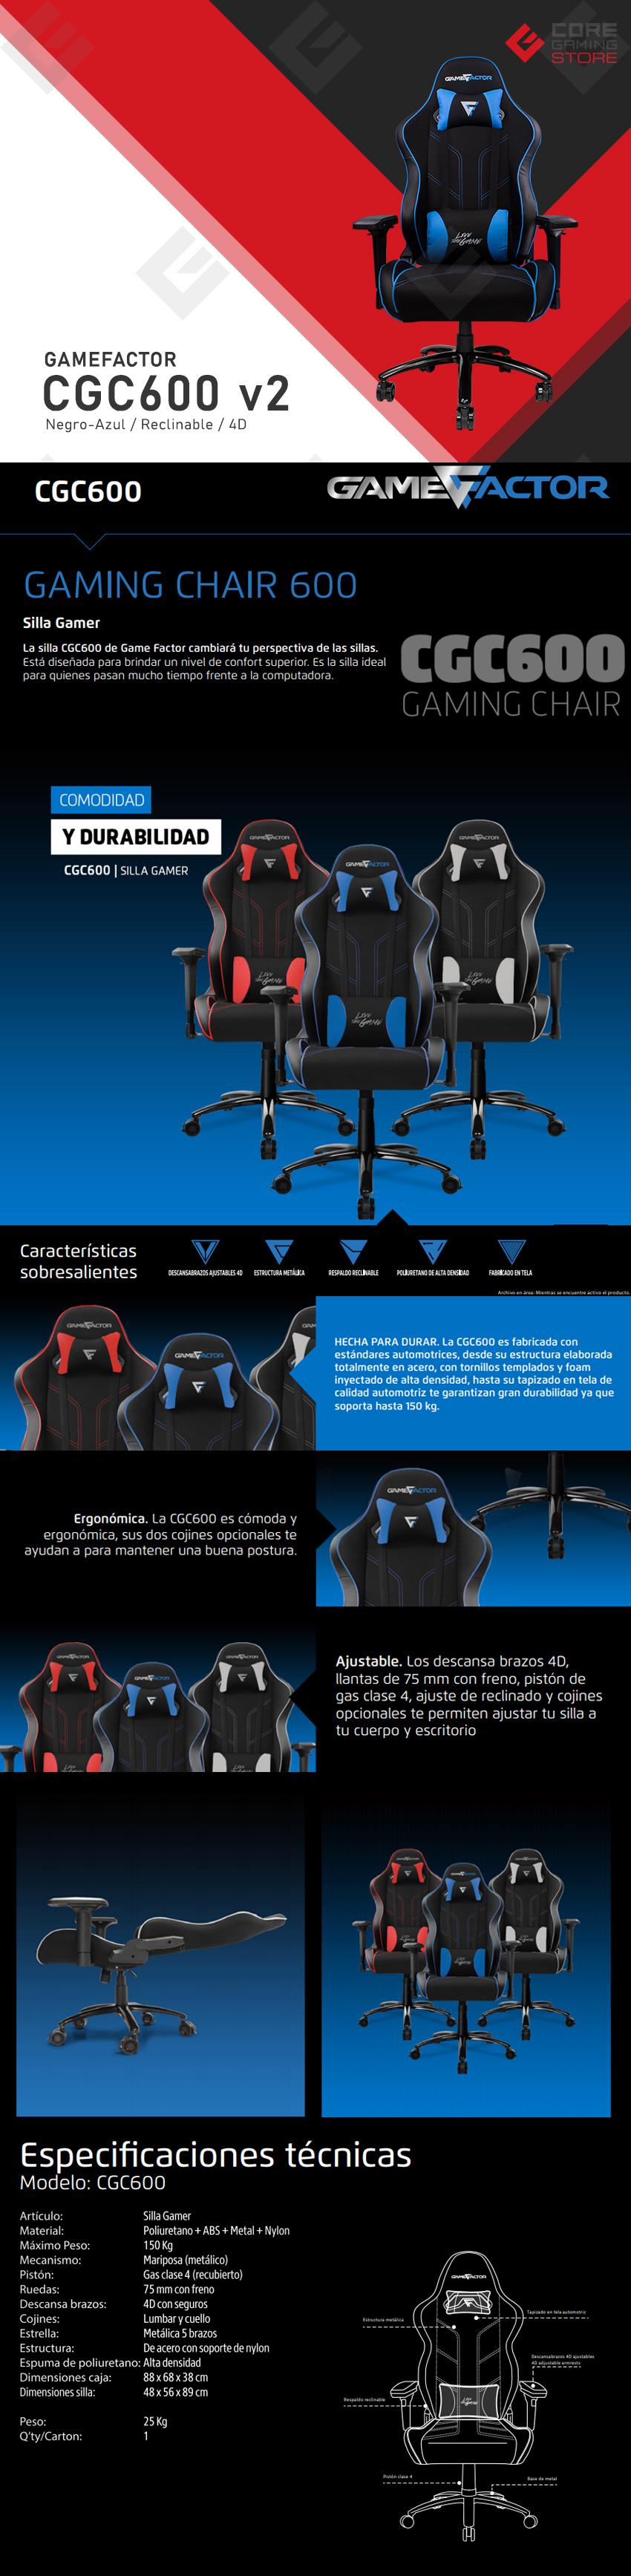 Silla Gamer GameFactor CGC600 v2, Negro/Azul, Reclinable, 4D, 150Kg, CGC600-BL